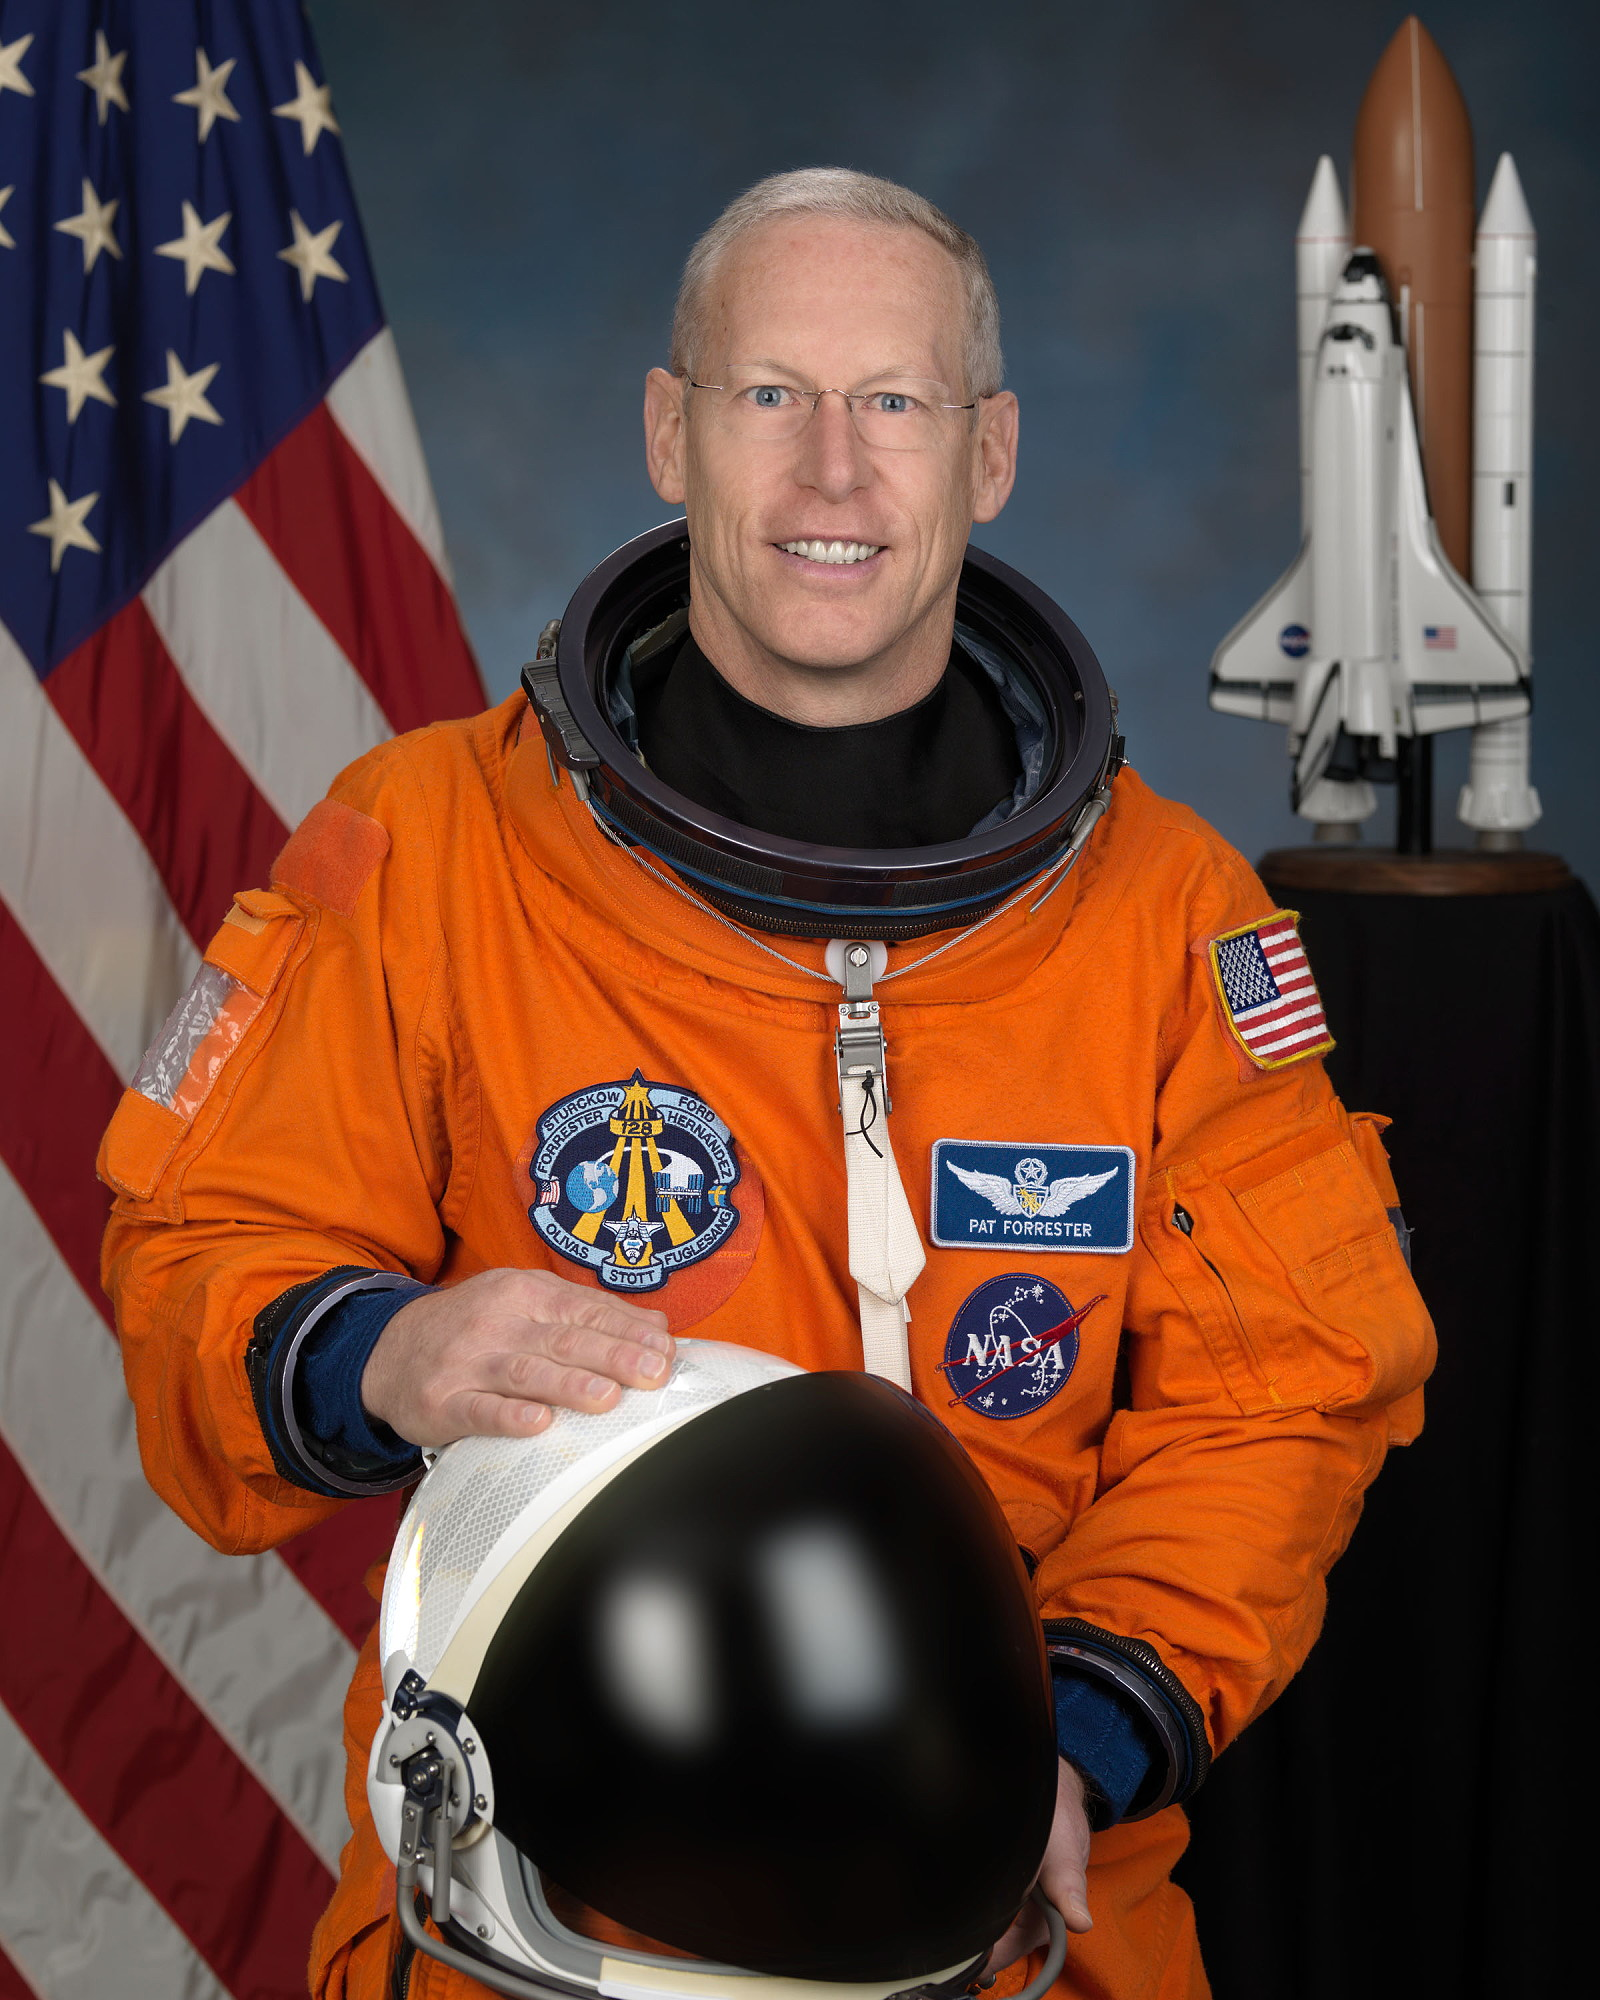 usa nasa astronauts - photo #41